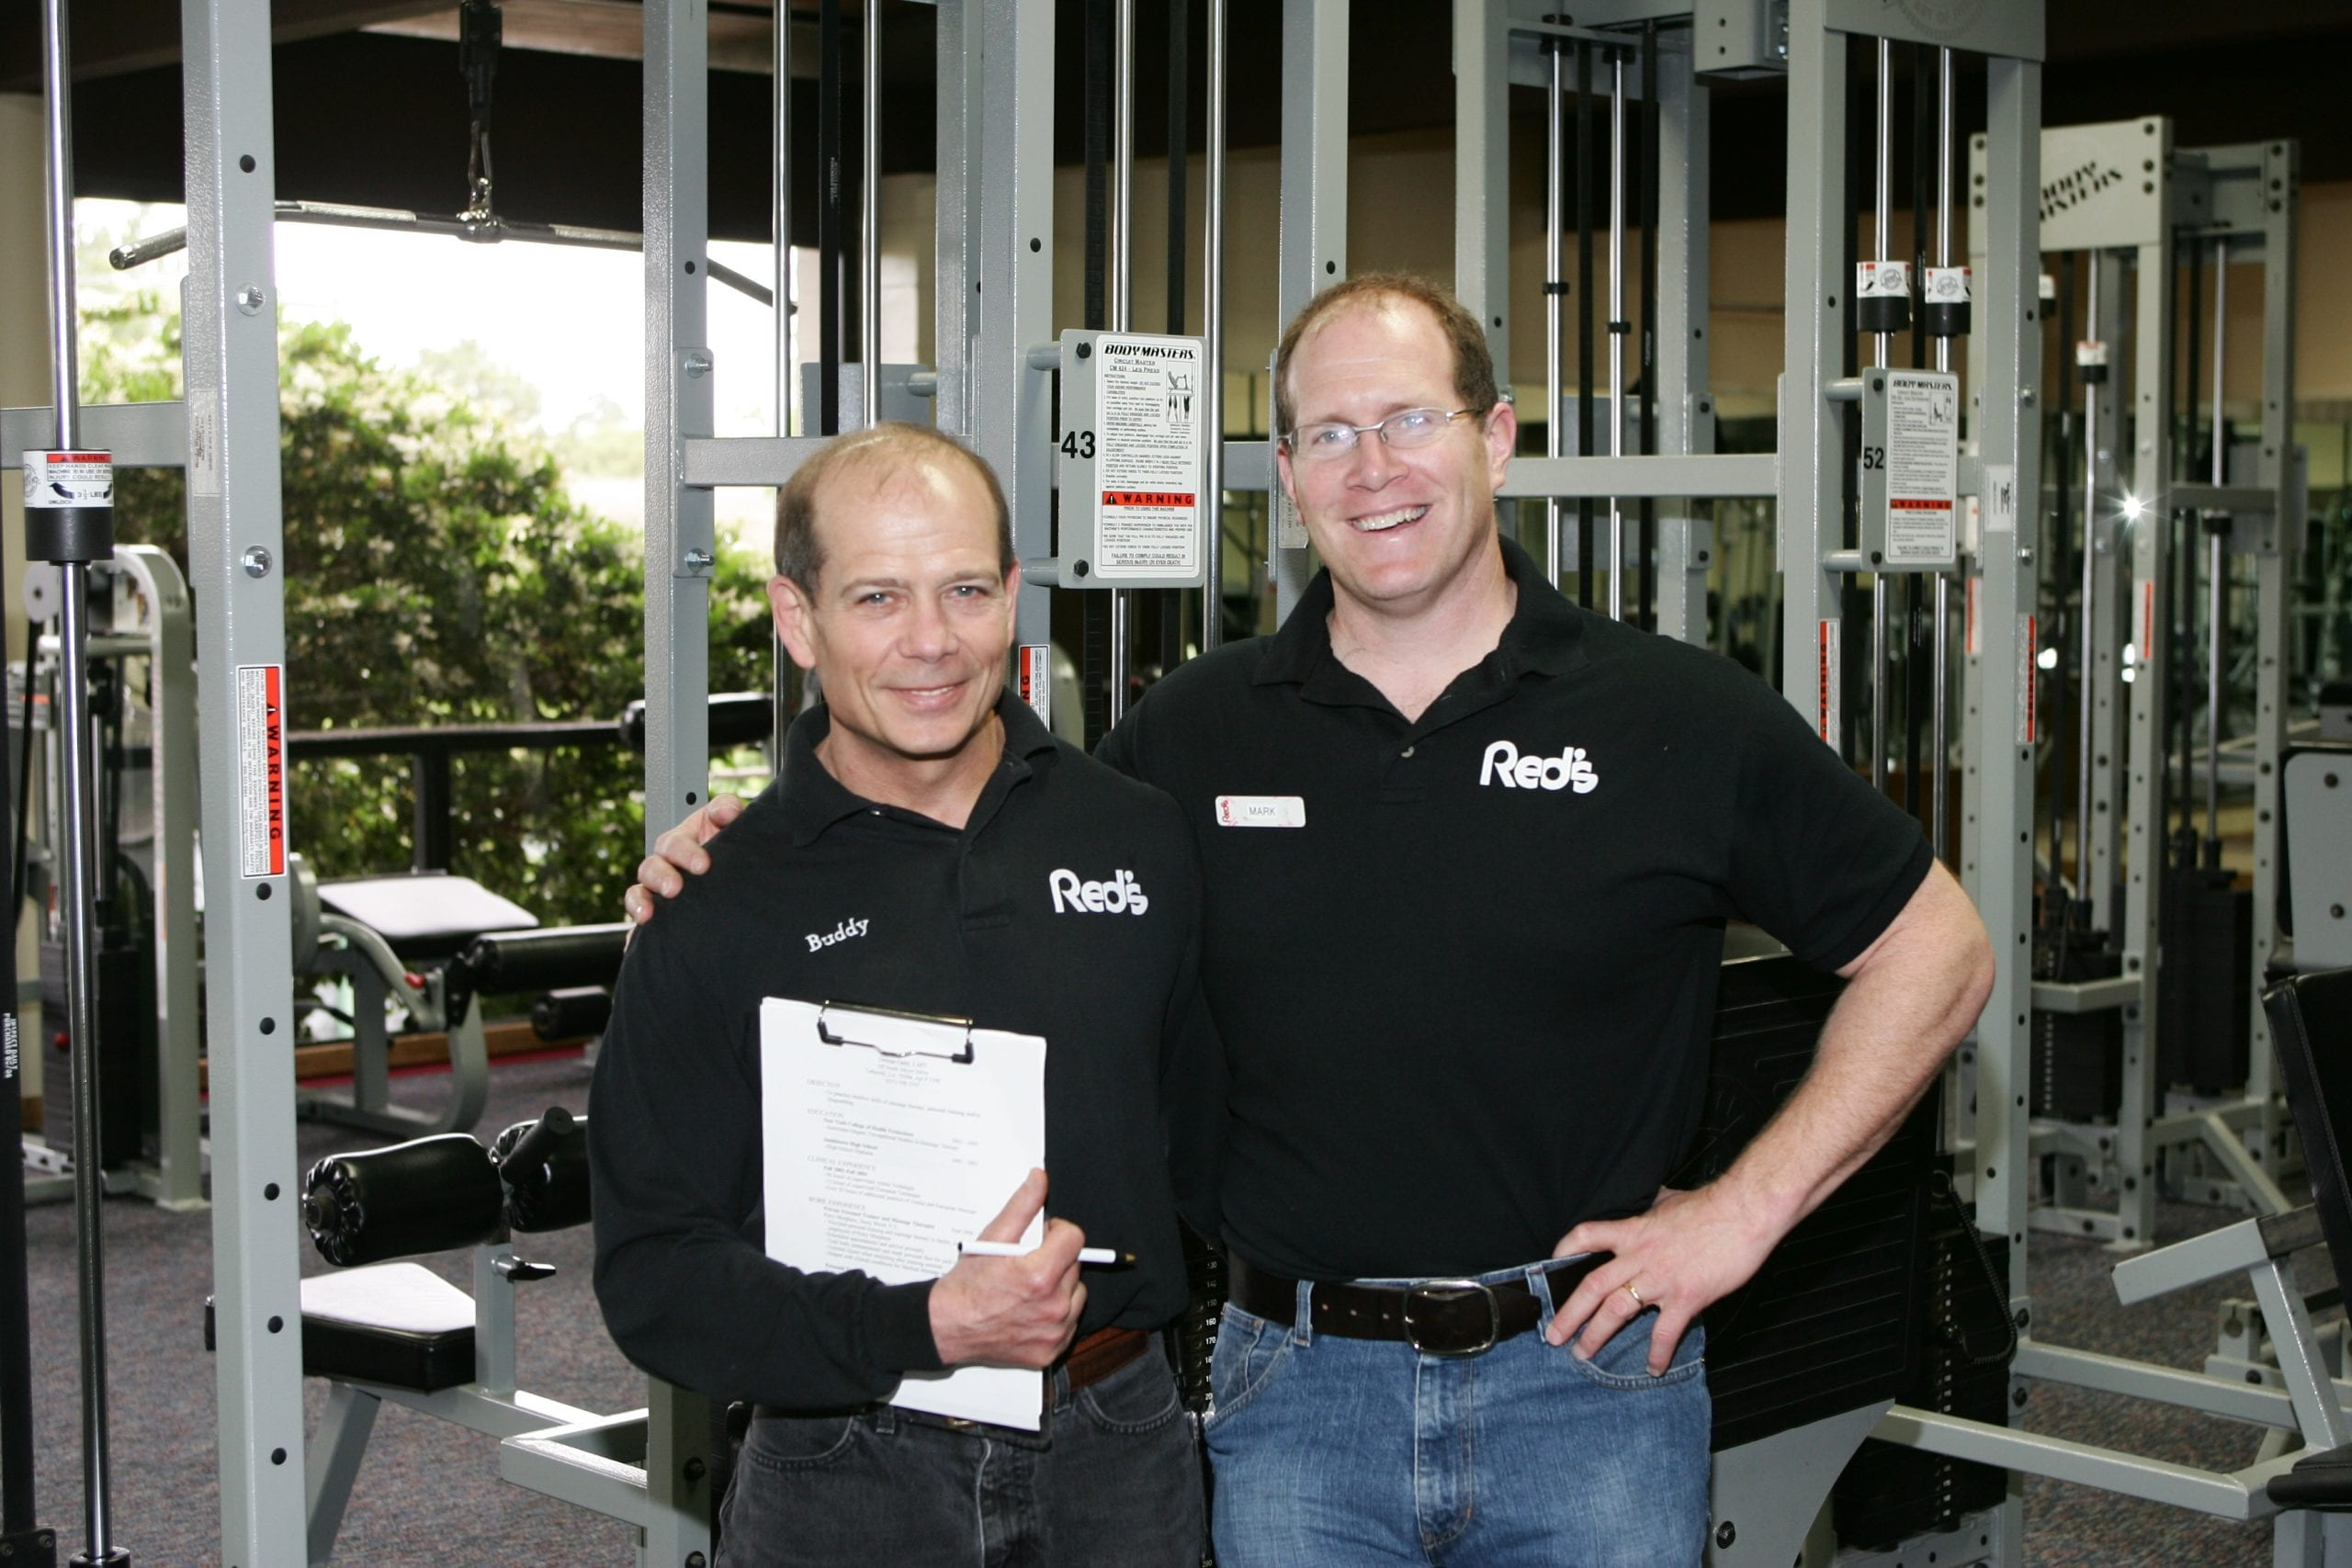 Buddy & Mark, Fitness Directors of Red's in Lafayette, La